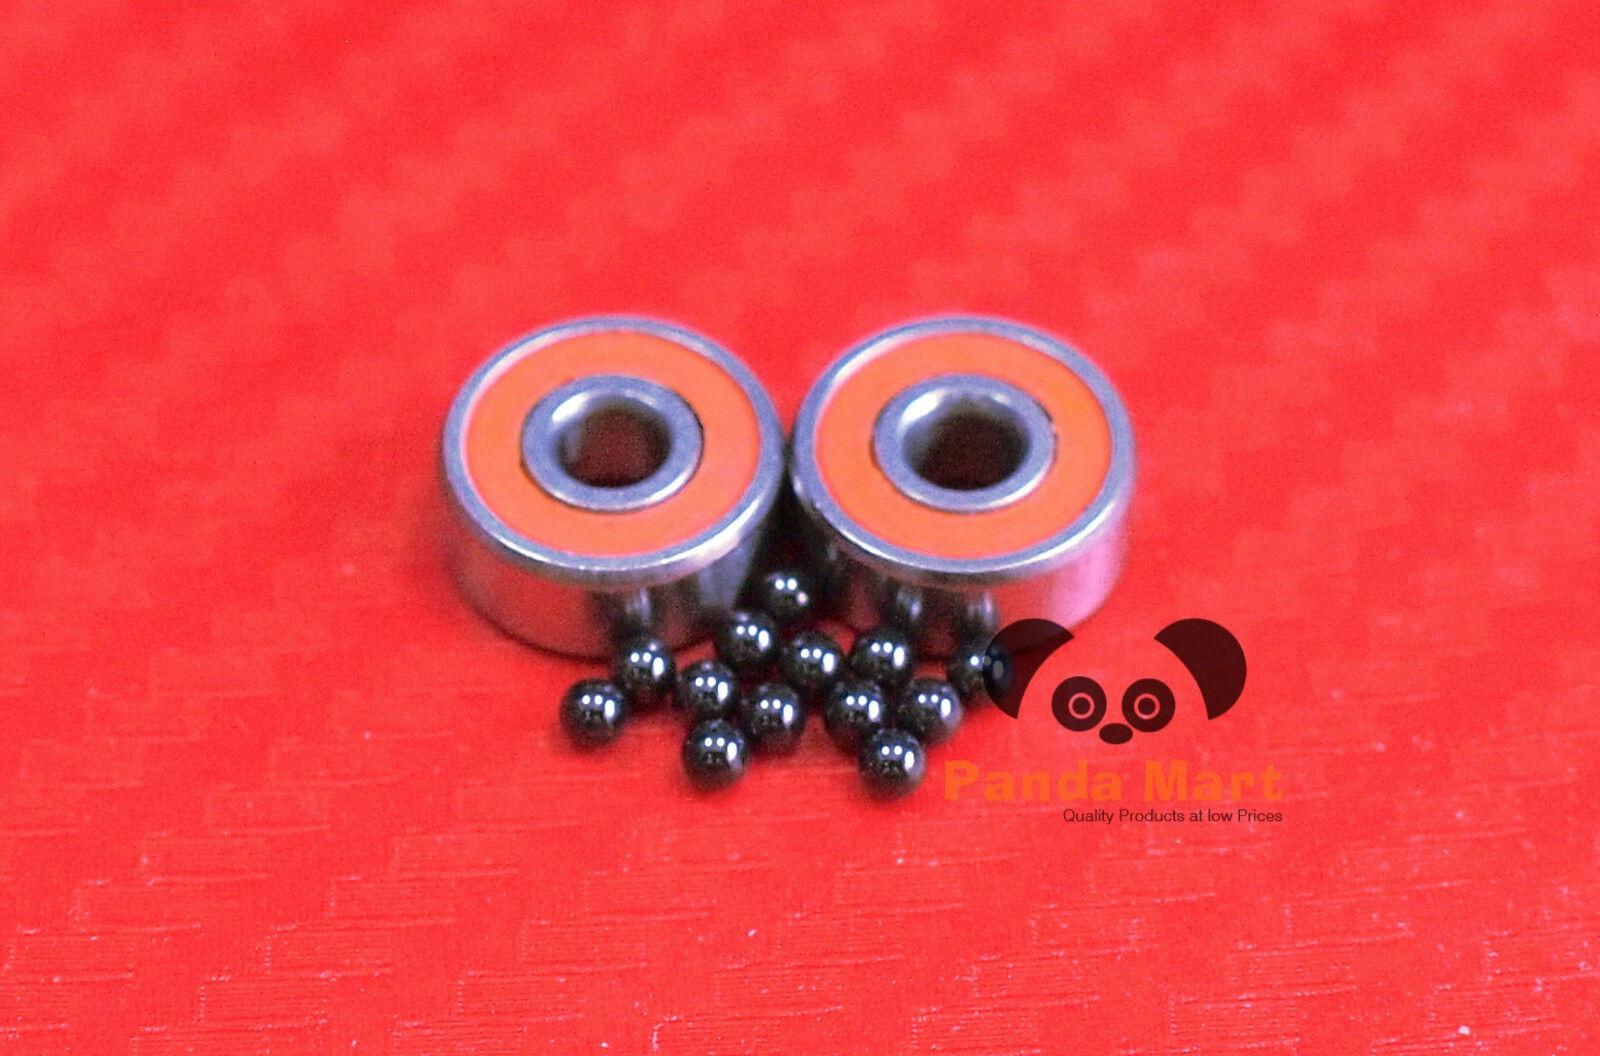 [QTY10] SMR147C-2OS AF2 ABEC-7 HYBRID CERAMIC orange Spool Bearing 7x14x5 7 14 5